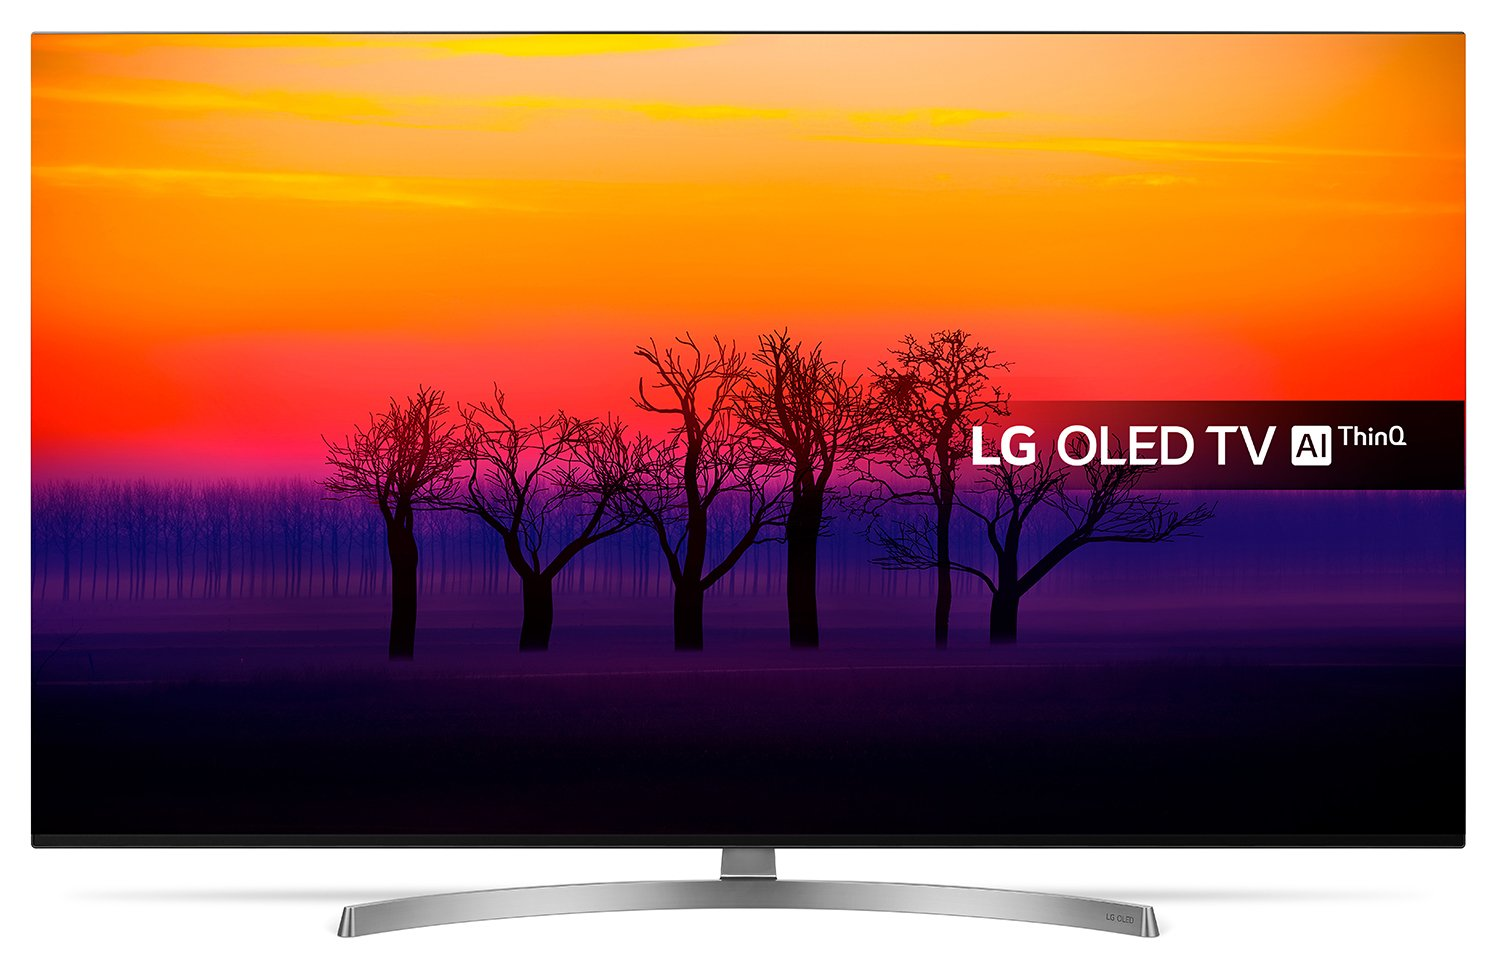 LG 55 Inch OLED55B8SLC OLED Smart Ultra HD TV with HDR